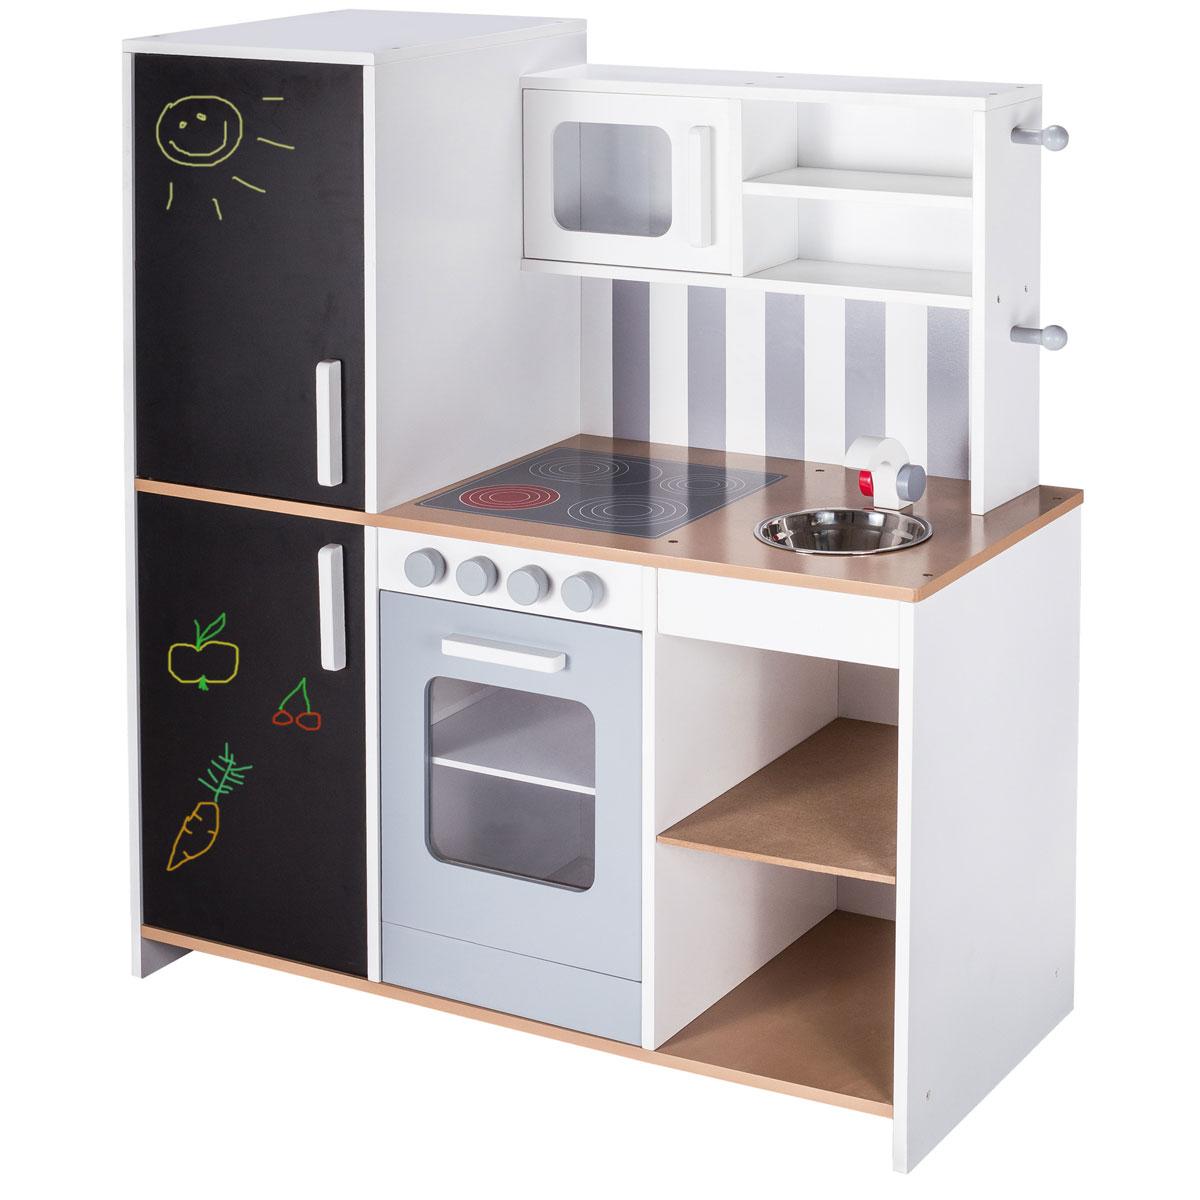 Cucine per bambini in legno duylinh for - Legno per cucine ...